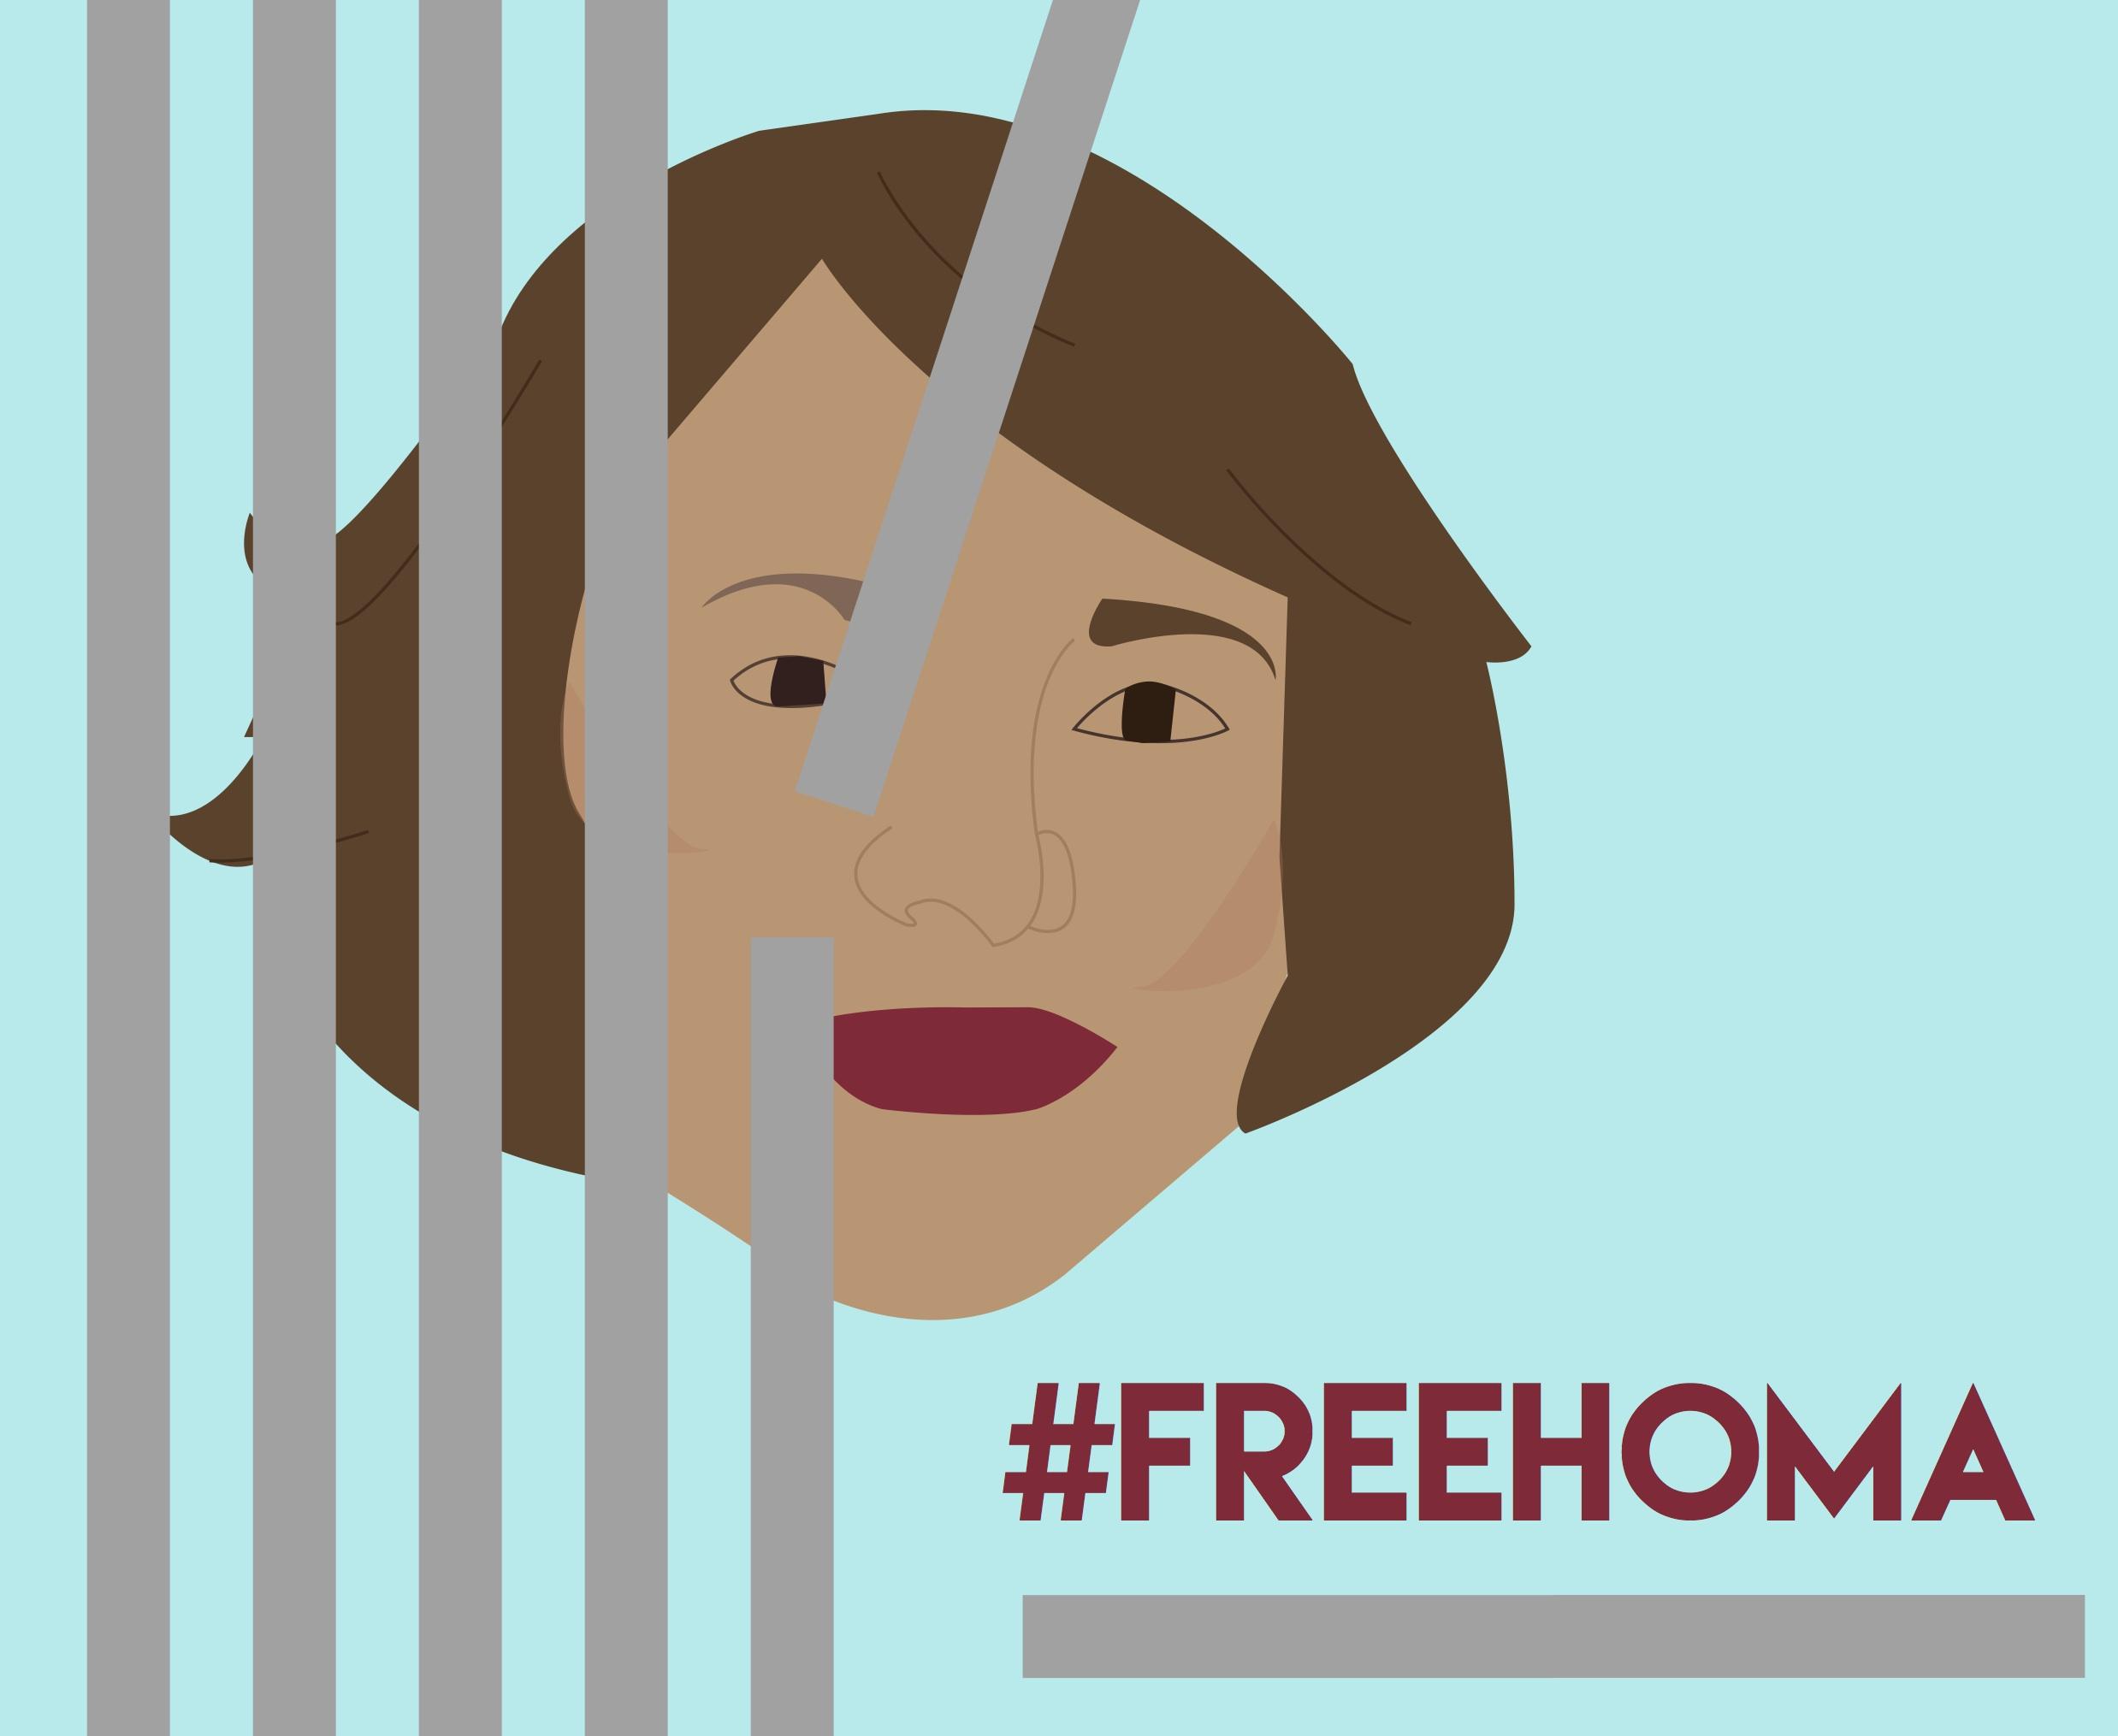 Free Homa Hoodfar